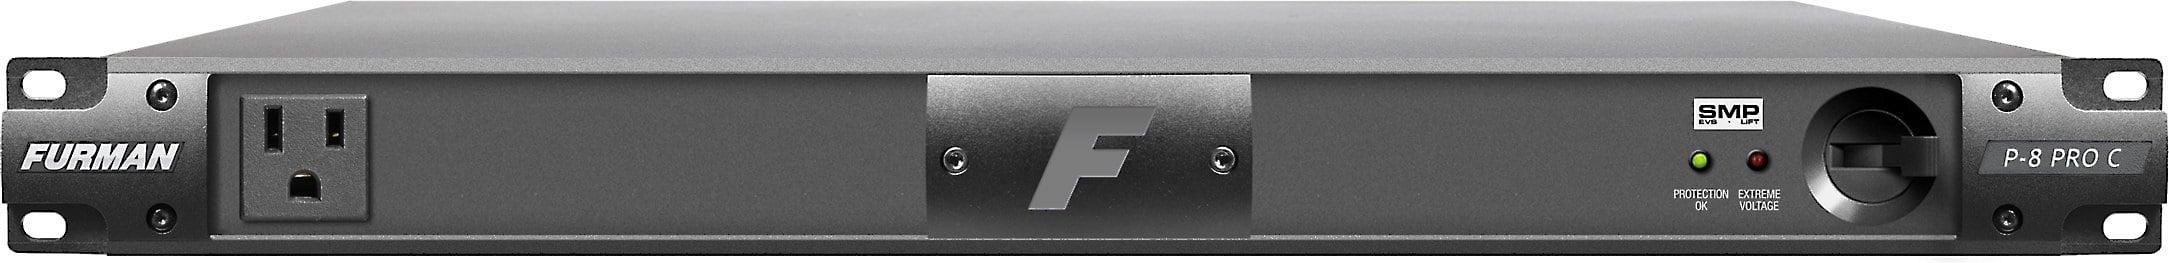 furman-p8-pro-c-20amp-power-conditioner.jpeg